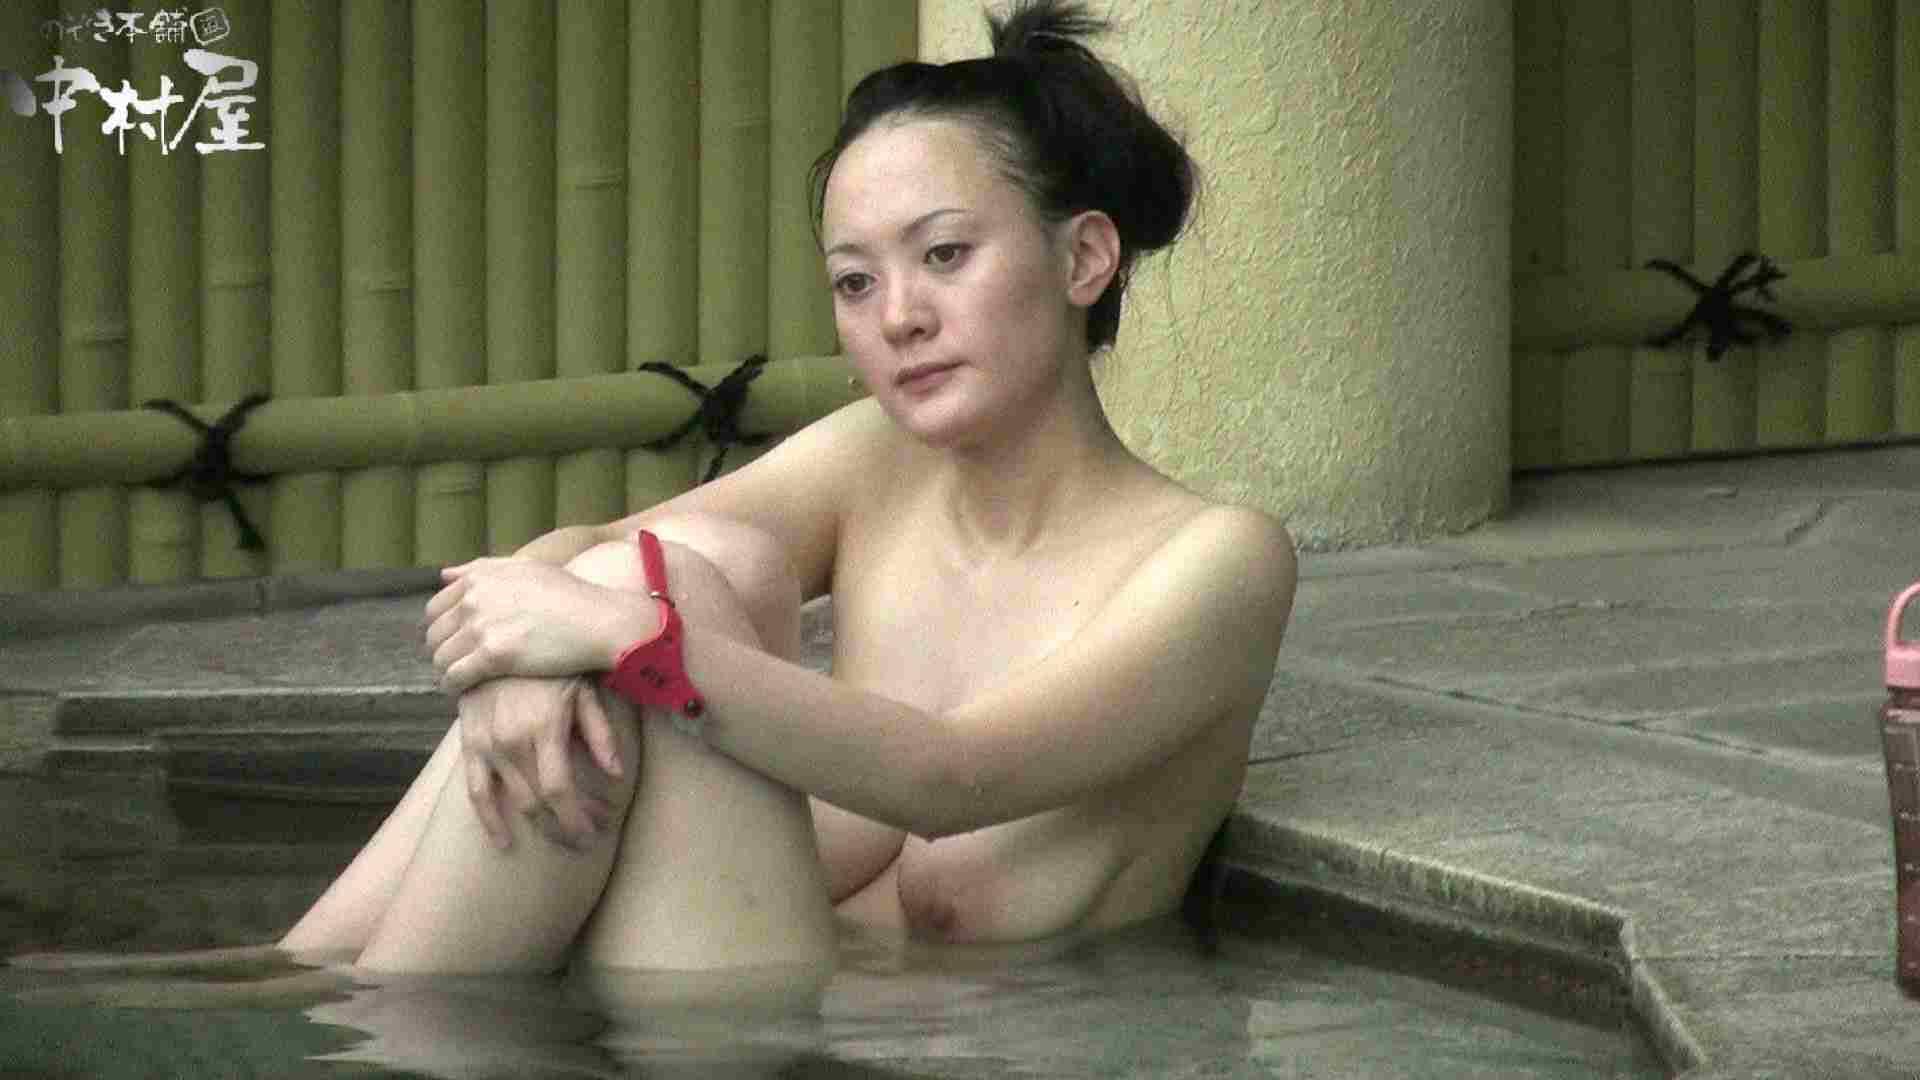 Aquaな露天風呂Vol.903 美しいOLの裸体 オメコ動画キャプチャ 98pic 95